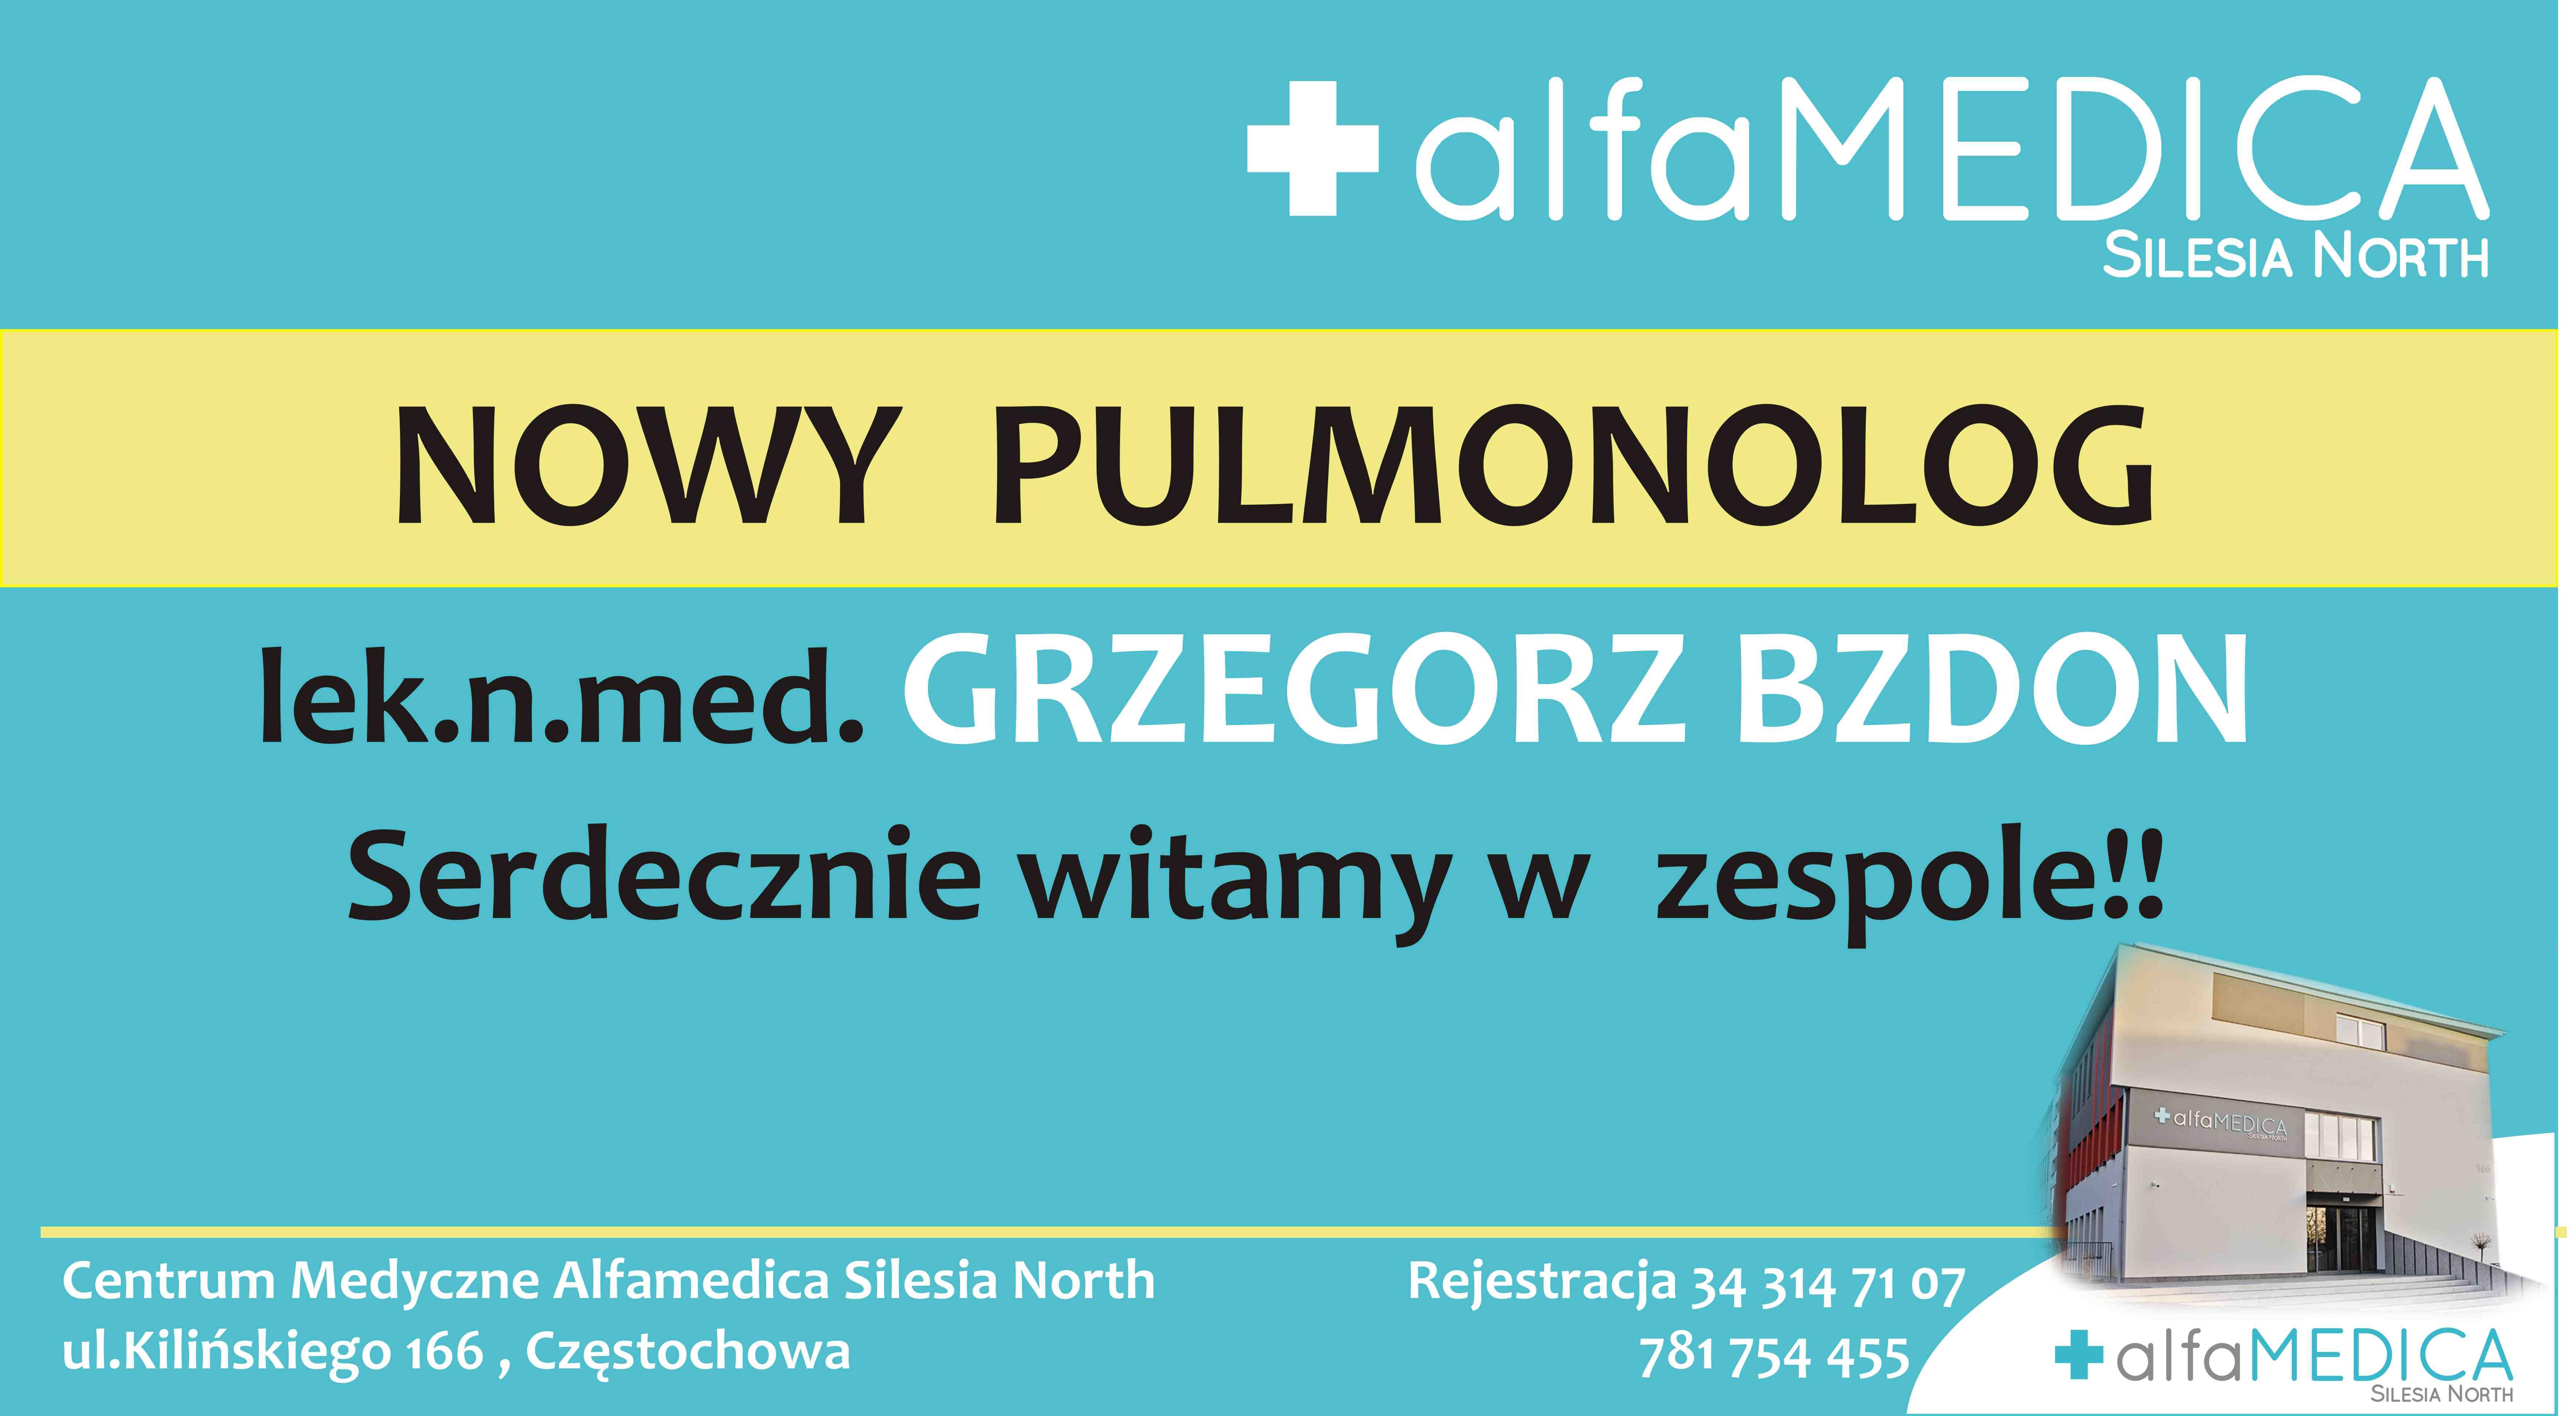 pulmonolog, poradnia pulmonologiczna. choroby płuc, bzdon